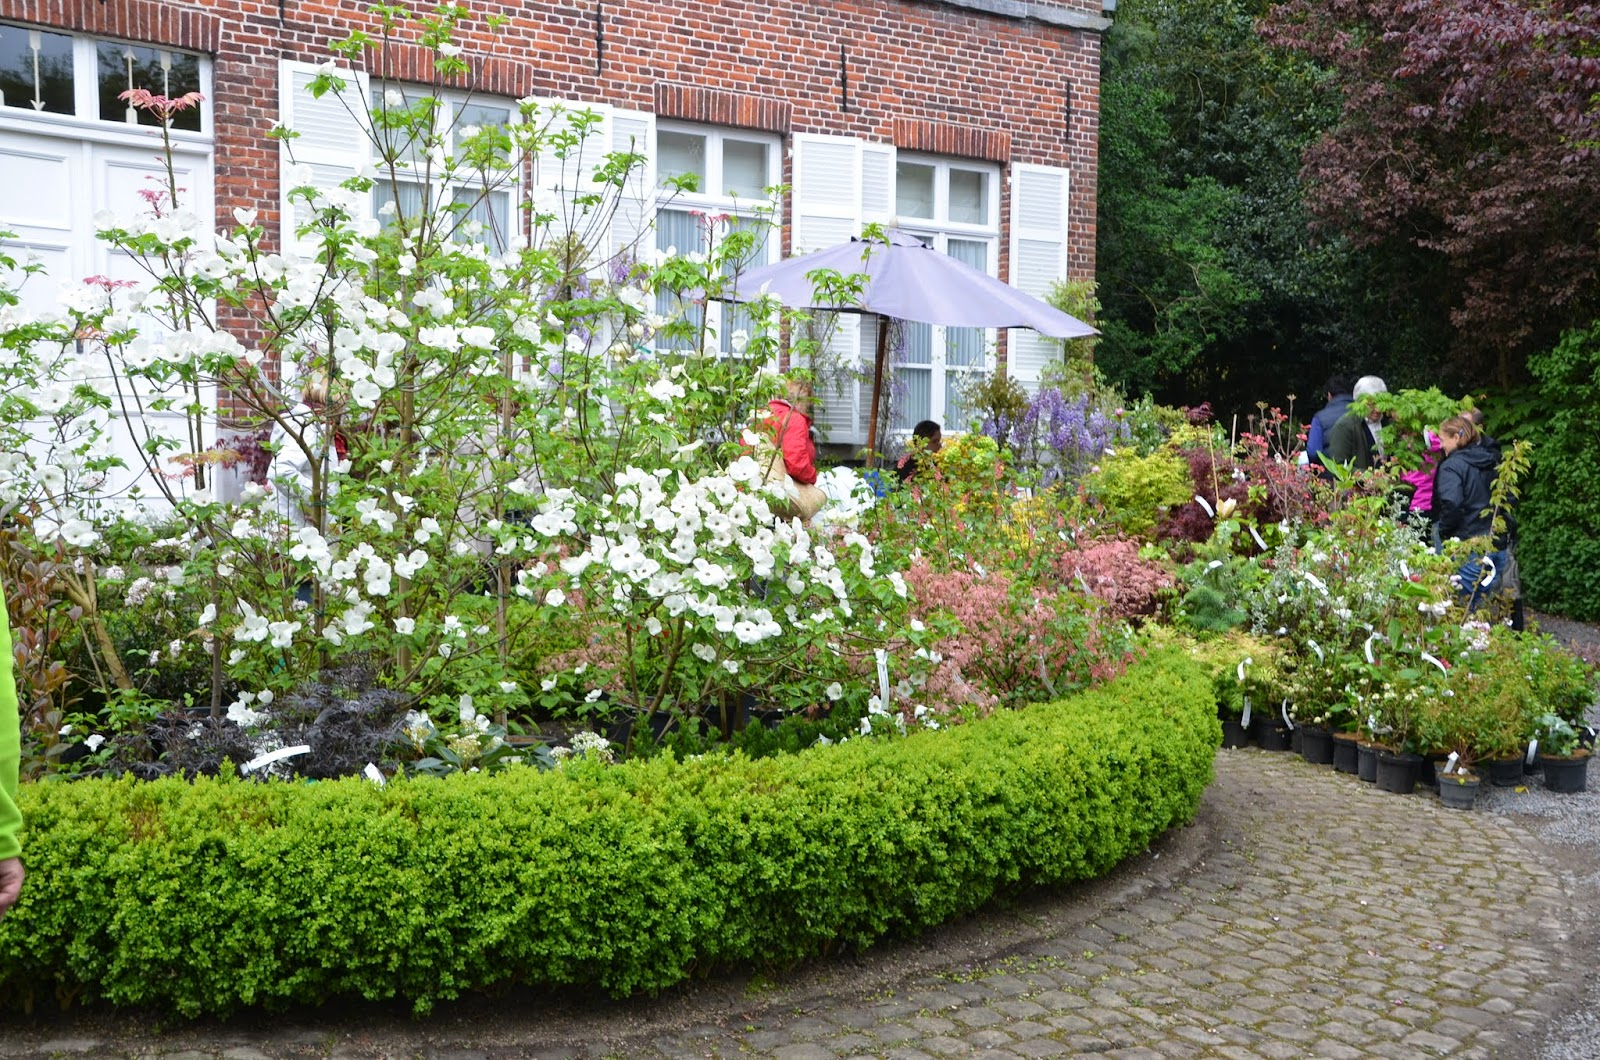 Mon Jardin En Avril mon jardin mes merveilles: la feuillerie - avril 2015 (2/3)